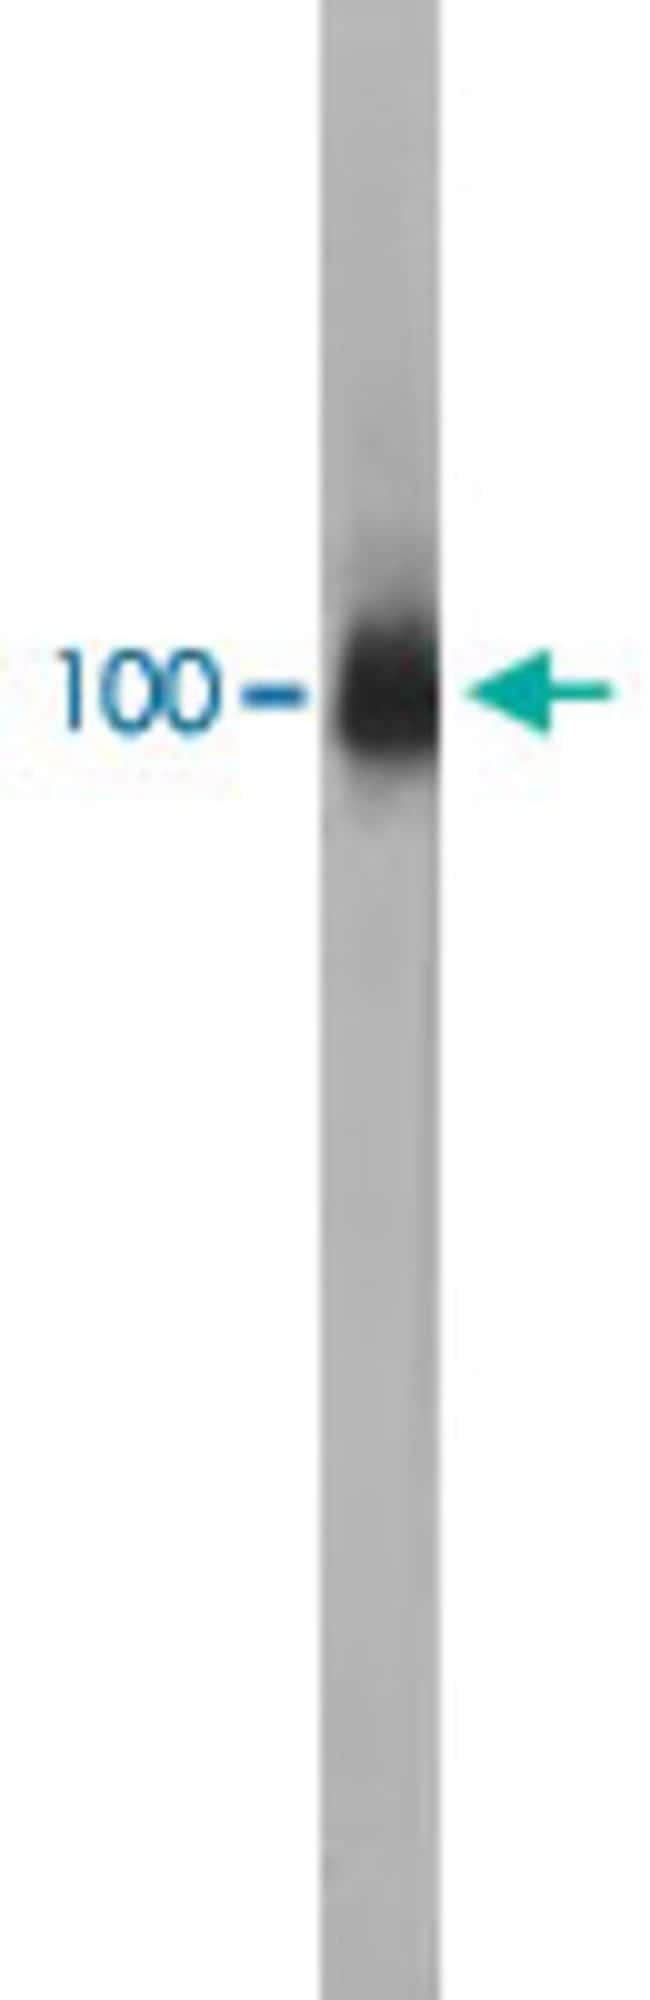 LAMP1 Mouse anti-Human, Clone: 5H6, Abnova 50μL; Unlabeled:Antibodies